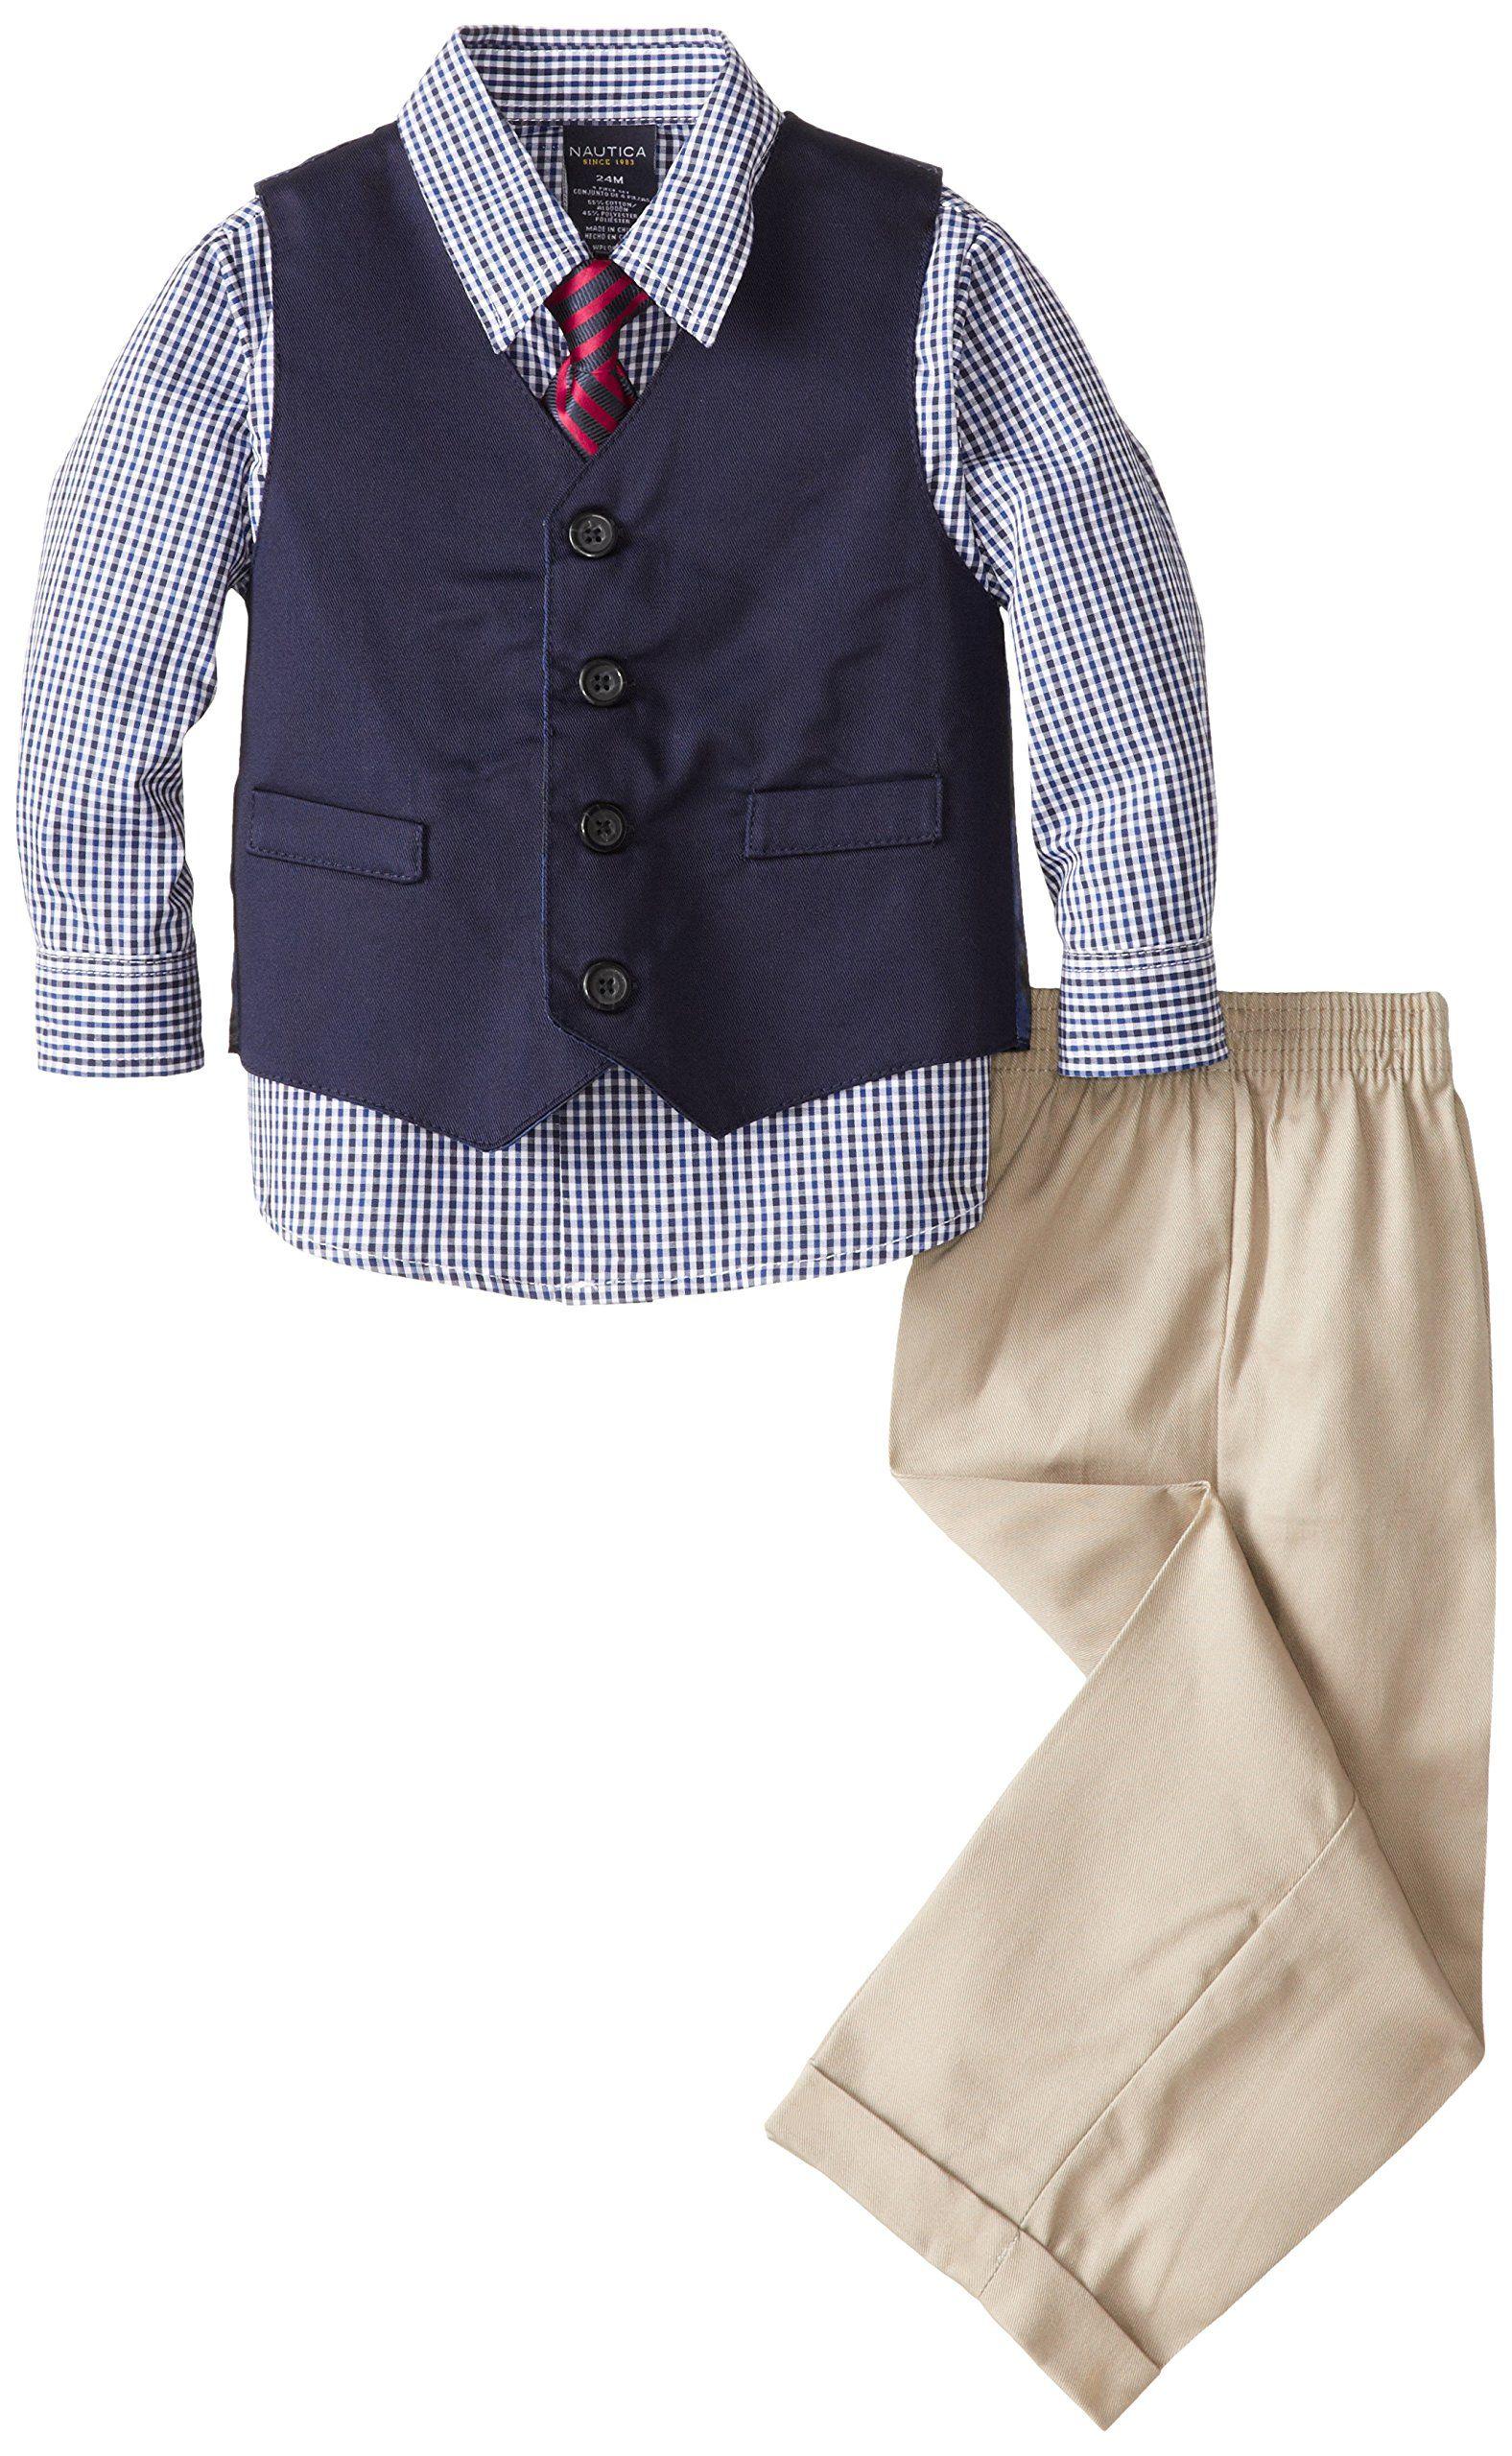 Nautica Baby Boys Twill Vest Set Khaki 18 Months